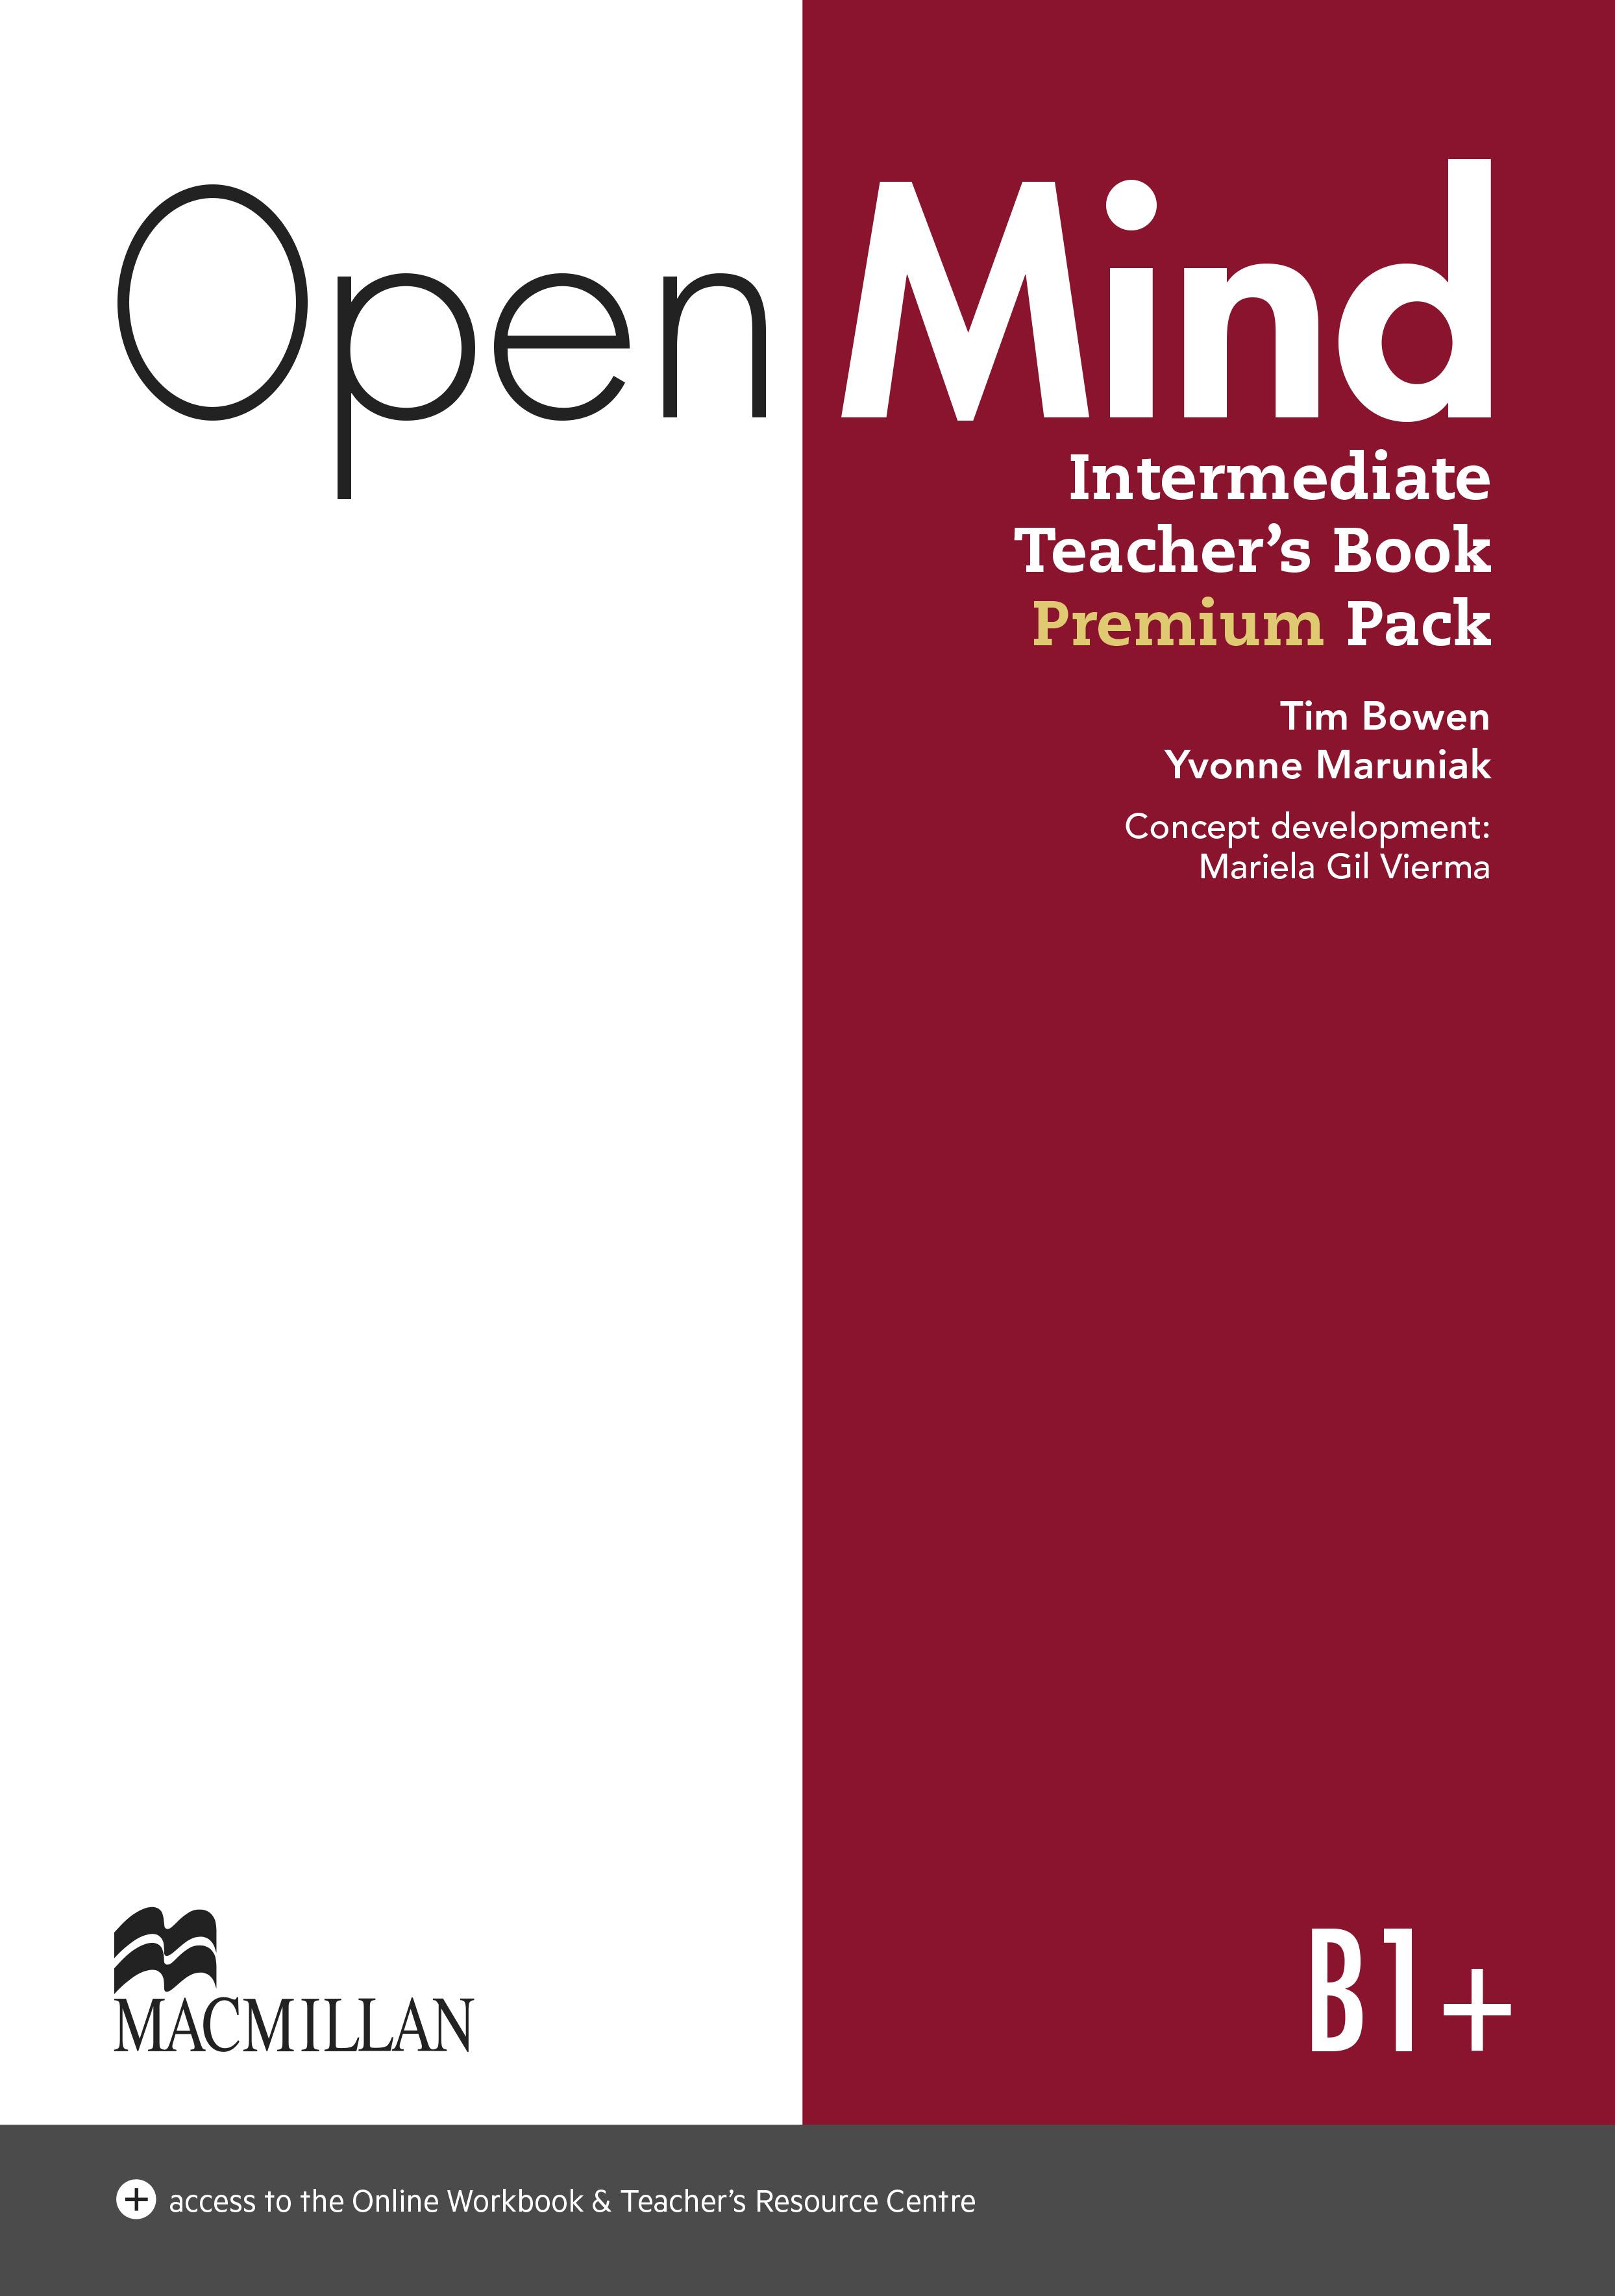 Open Mind Intermediate Teacher